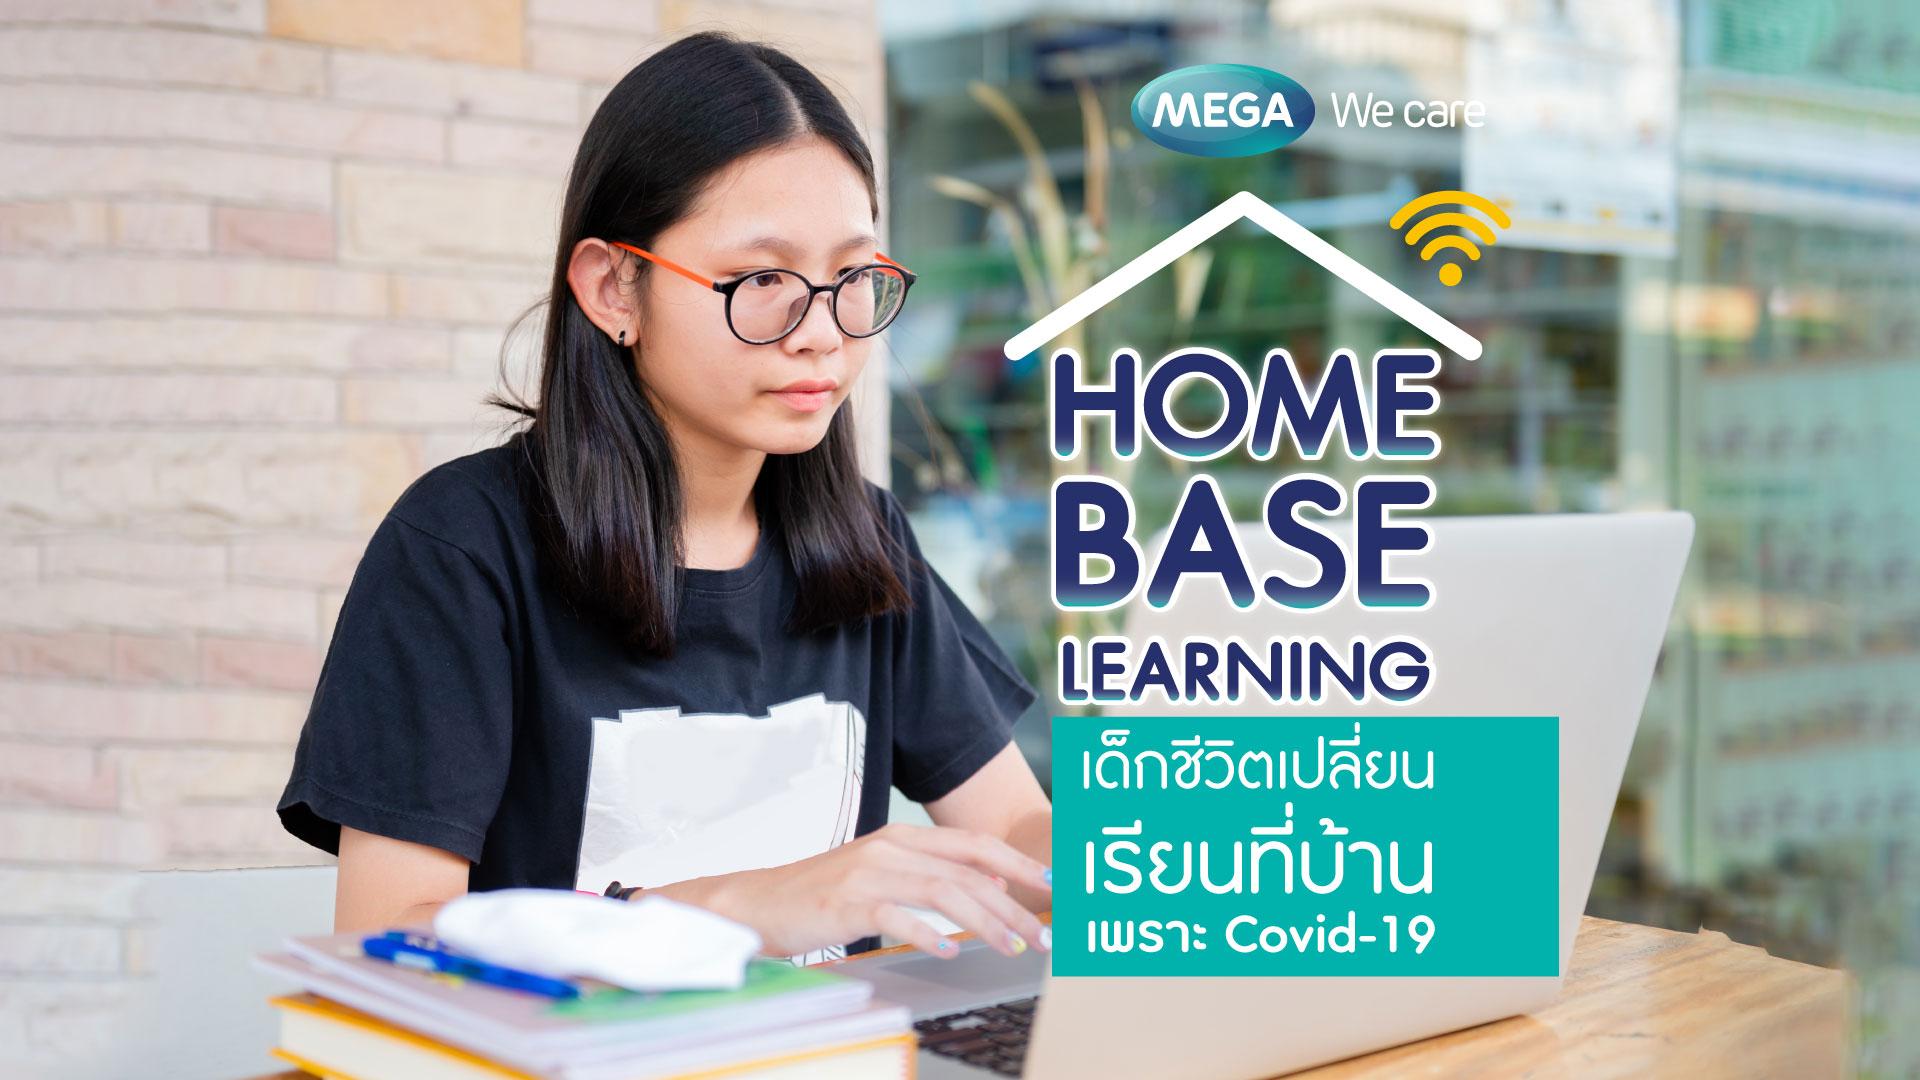 Home- Based Learning เด็กชีวิตเปลี่ยนเรียนที่บ้านเพราะ Covid-19